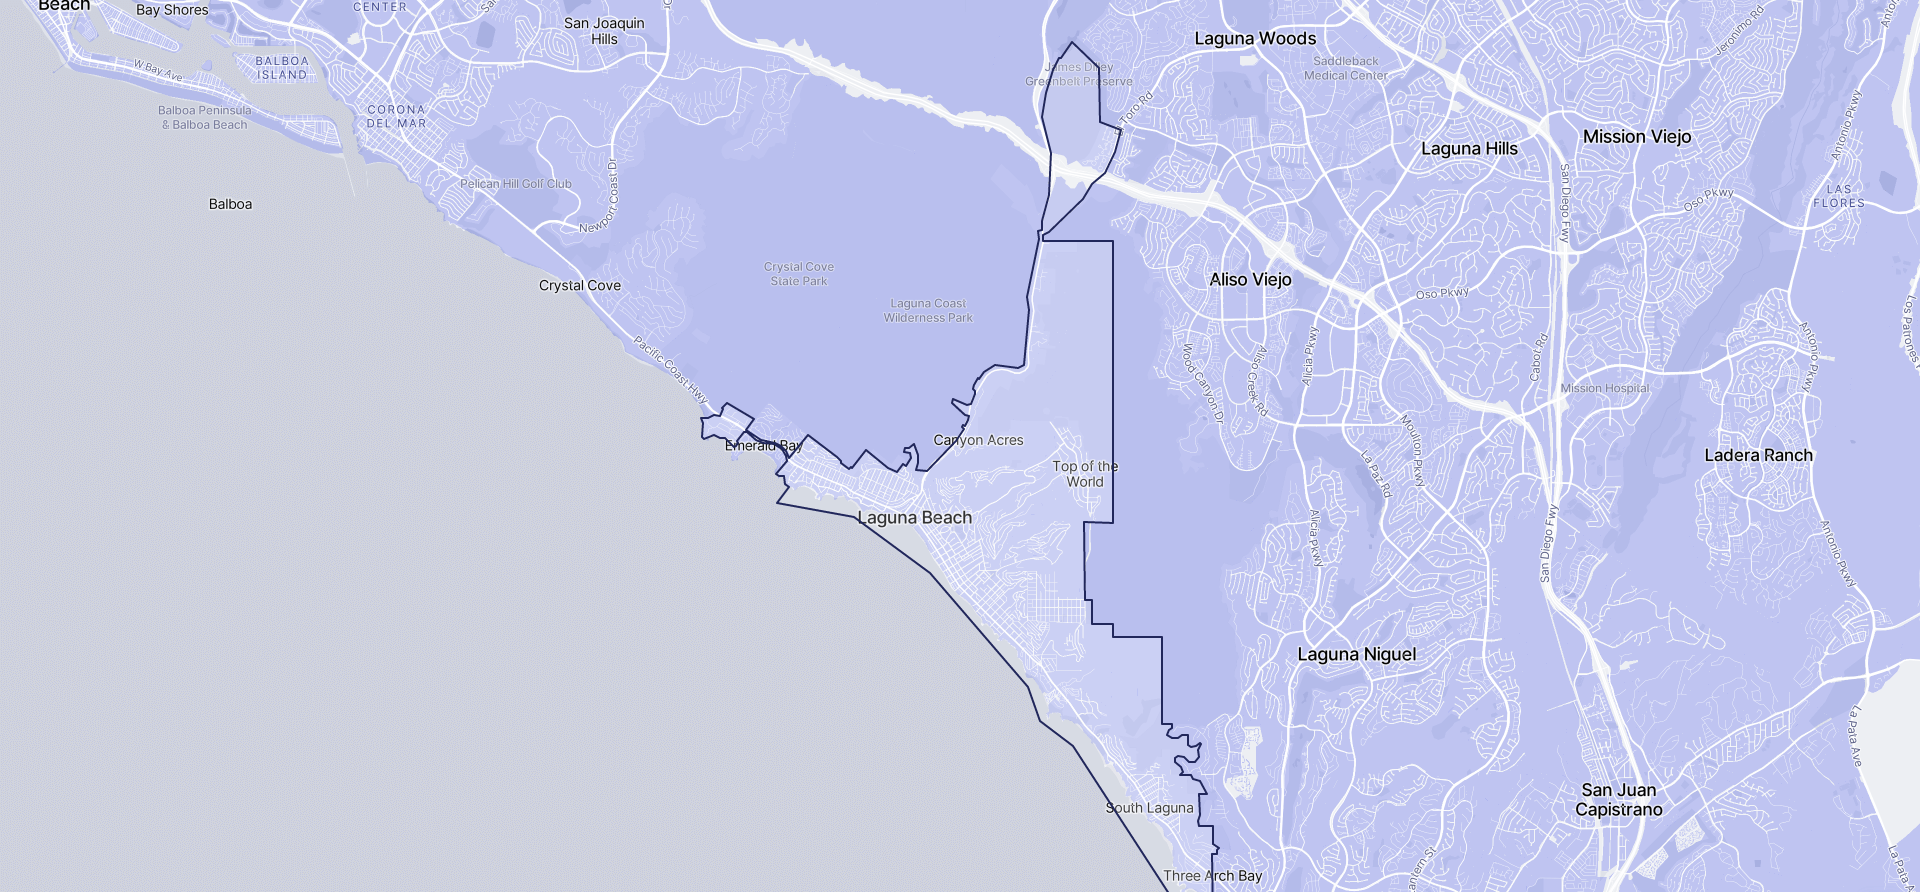 Image of Laguna Beach boundaries on a map.